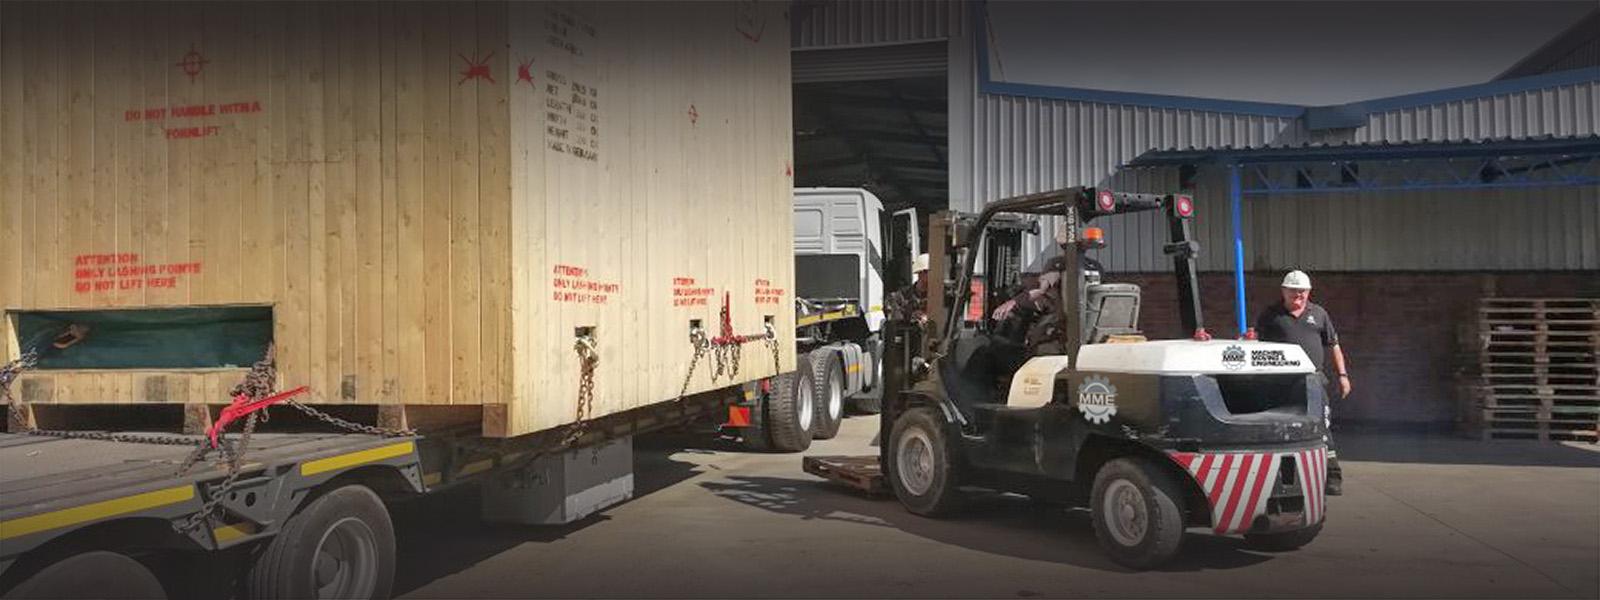 crating-warehousing-mme-Machine-Moving-Engineering-machinery-equipment-experts-Gauteng-kzn-south-africa